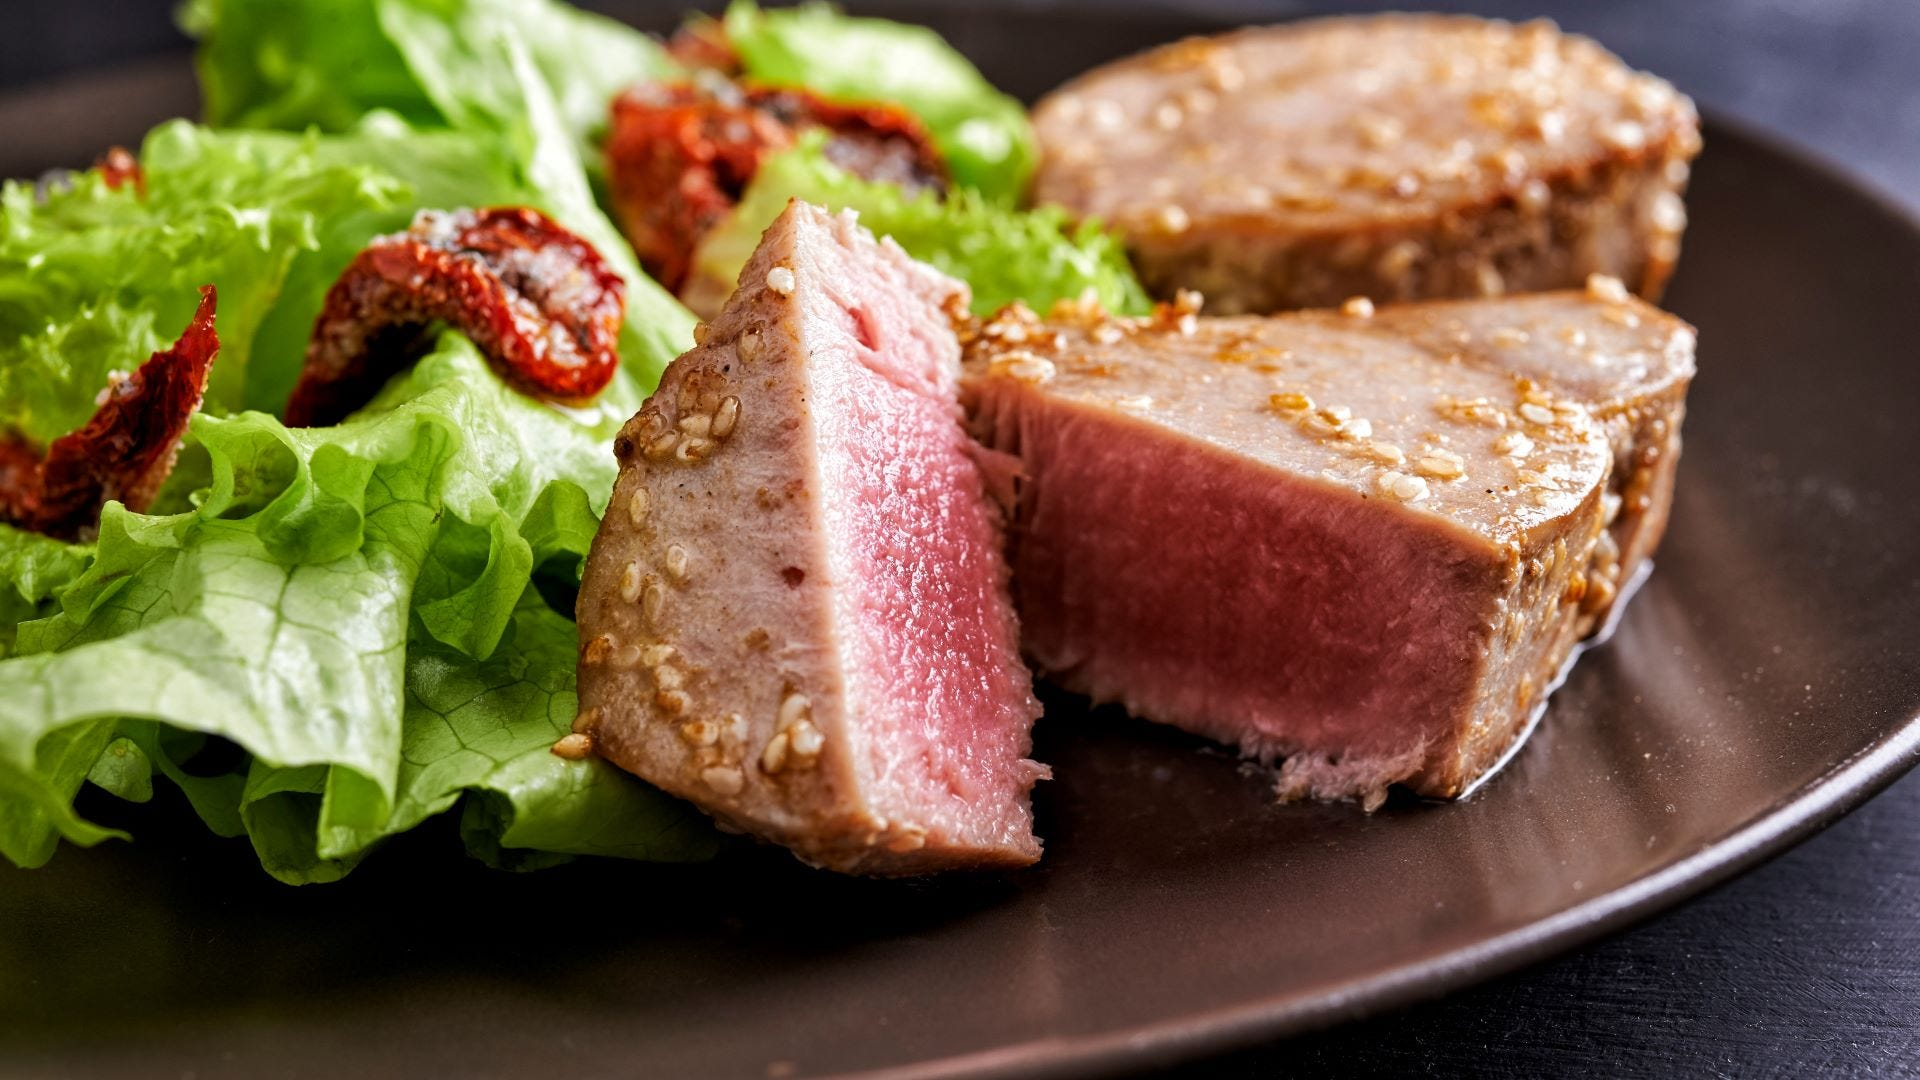 Plate of tuna steak with salad.